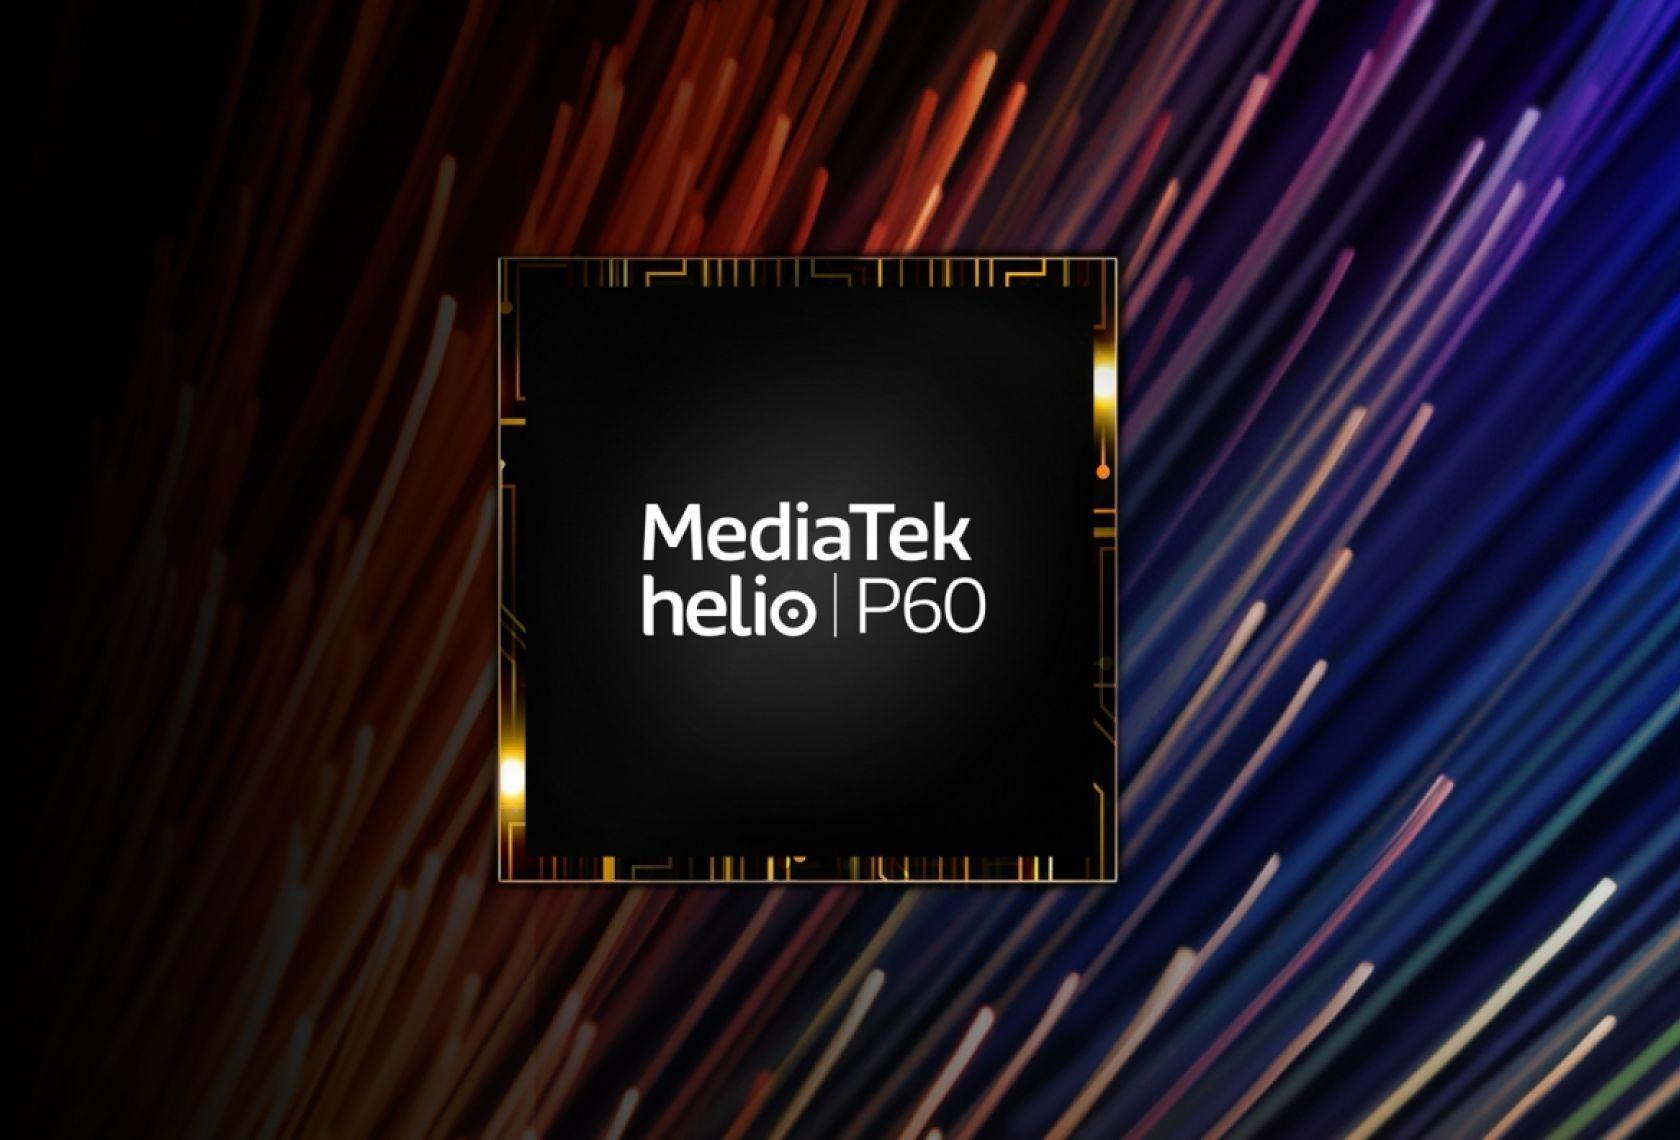 MediaTekがHelio P60を発表。12nm、A73x4+A53x4のオクタコア構成